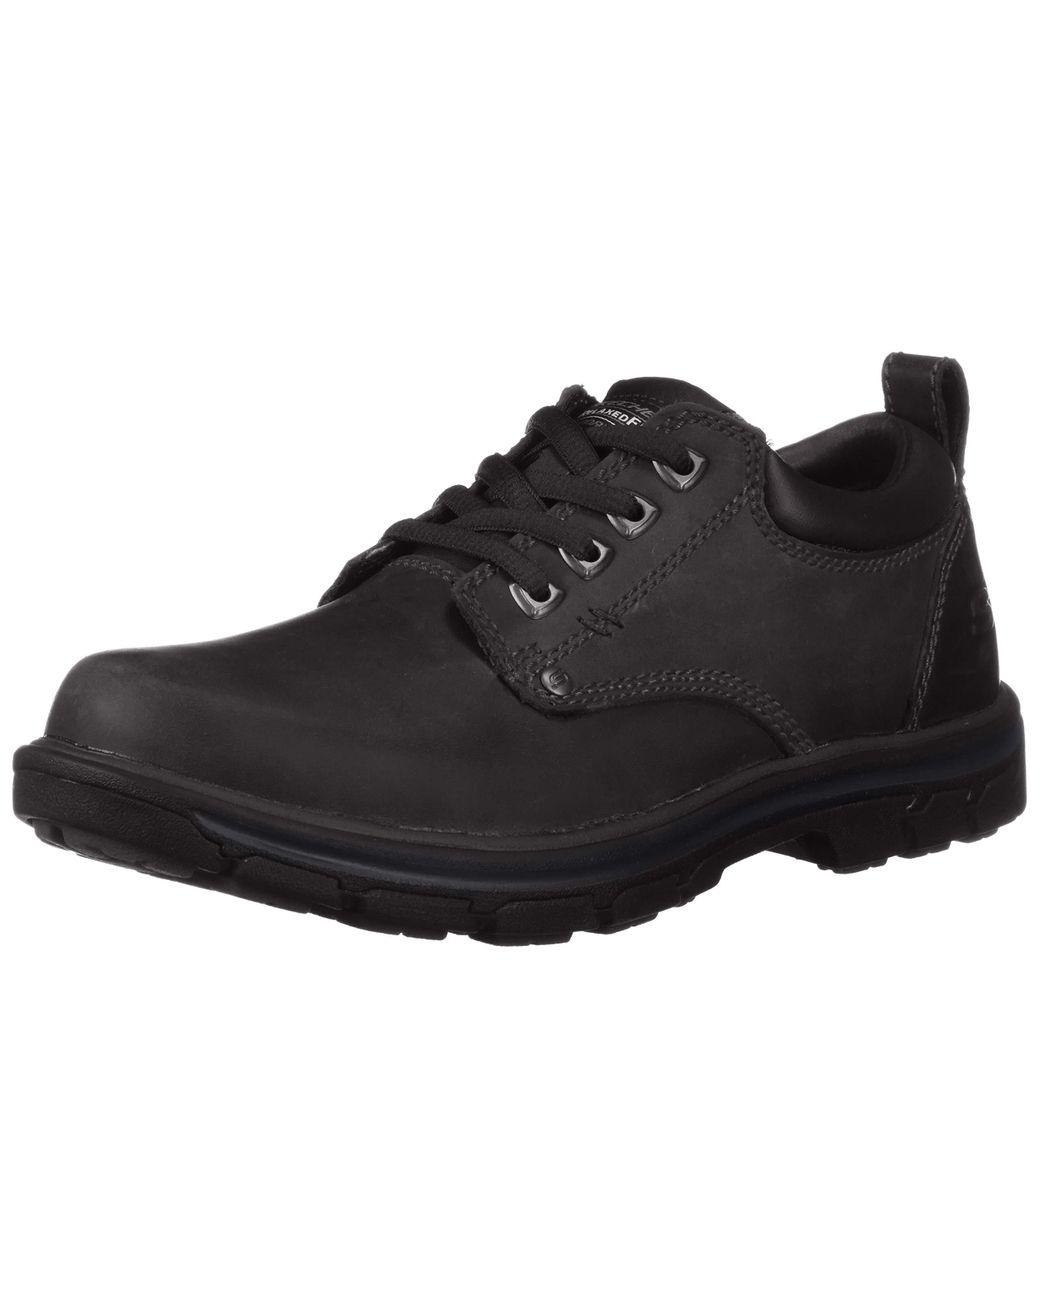 Skechers Leather S Segment Rilar 64260